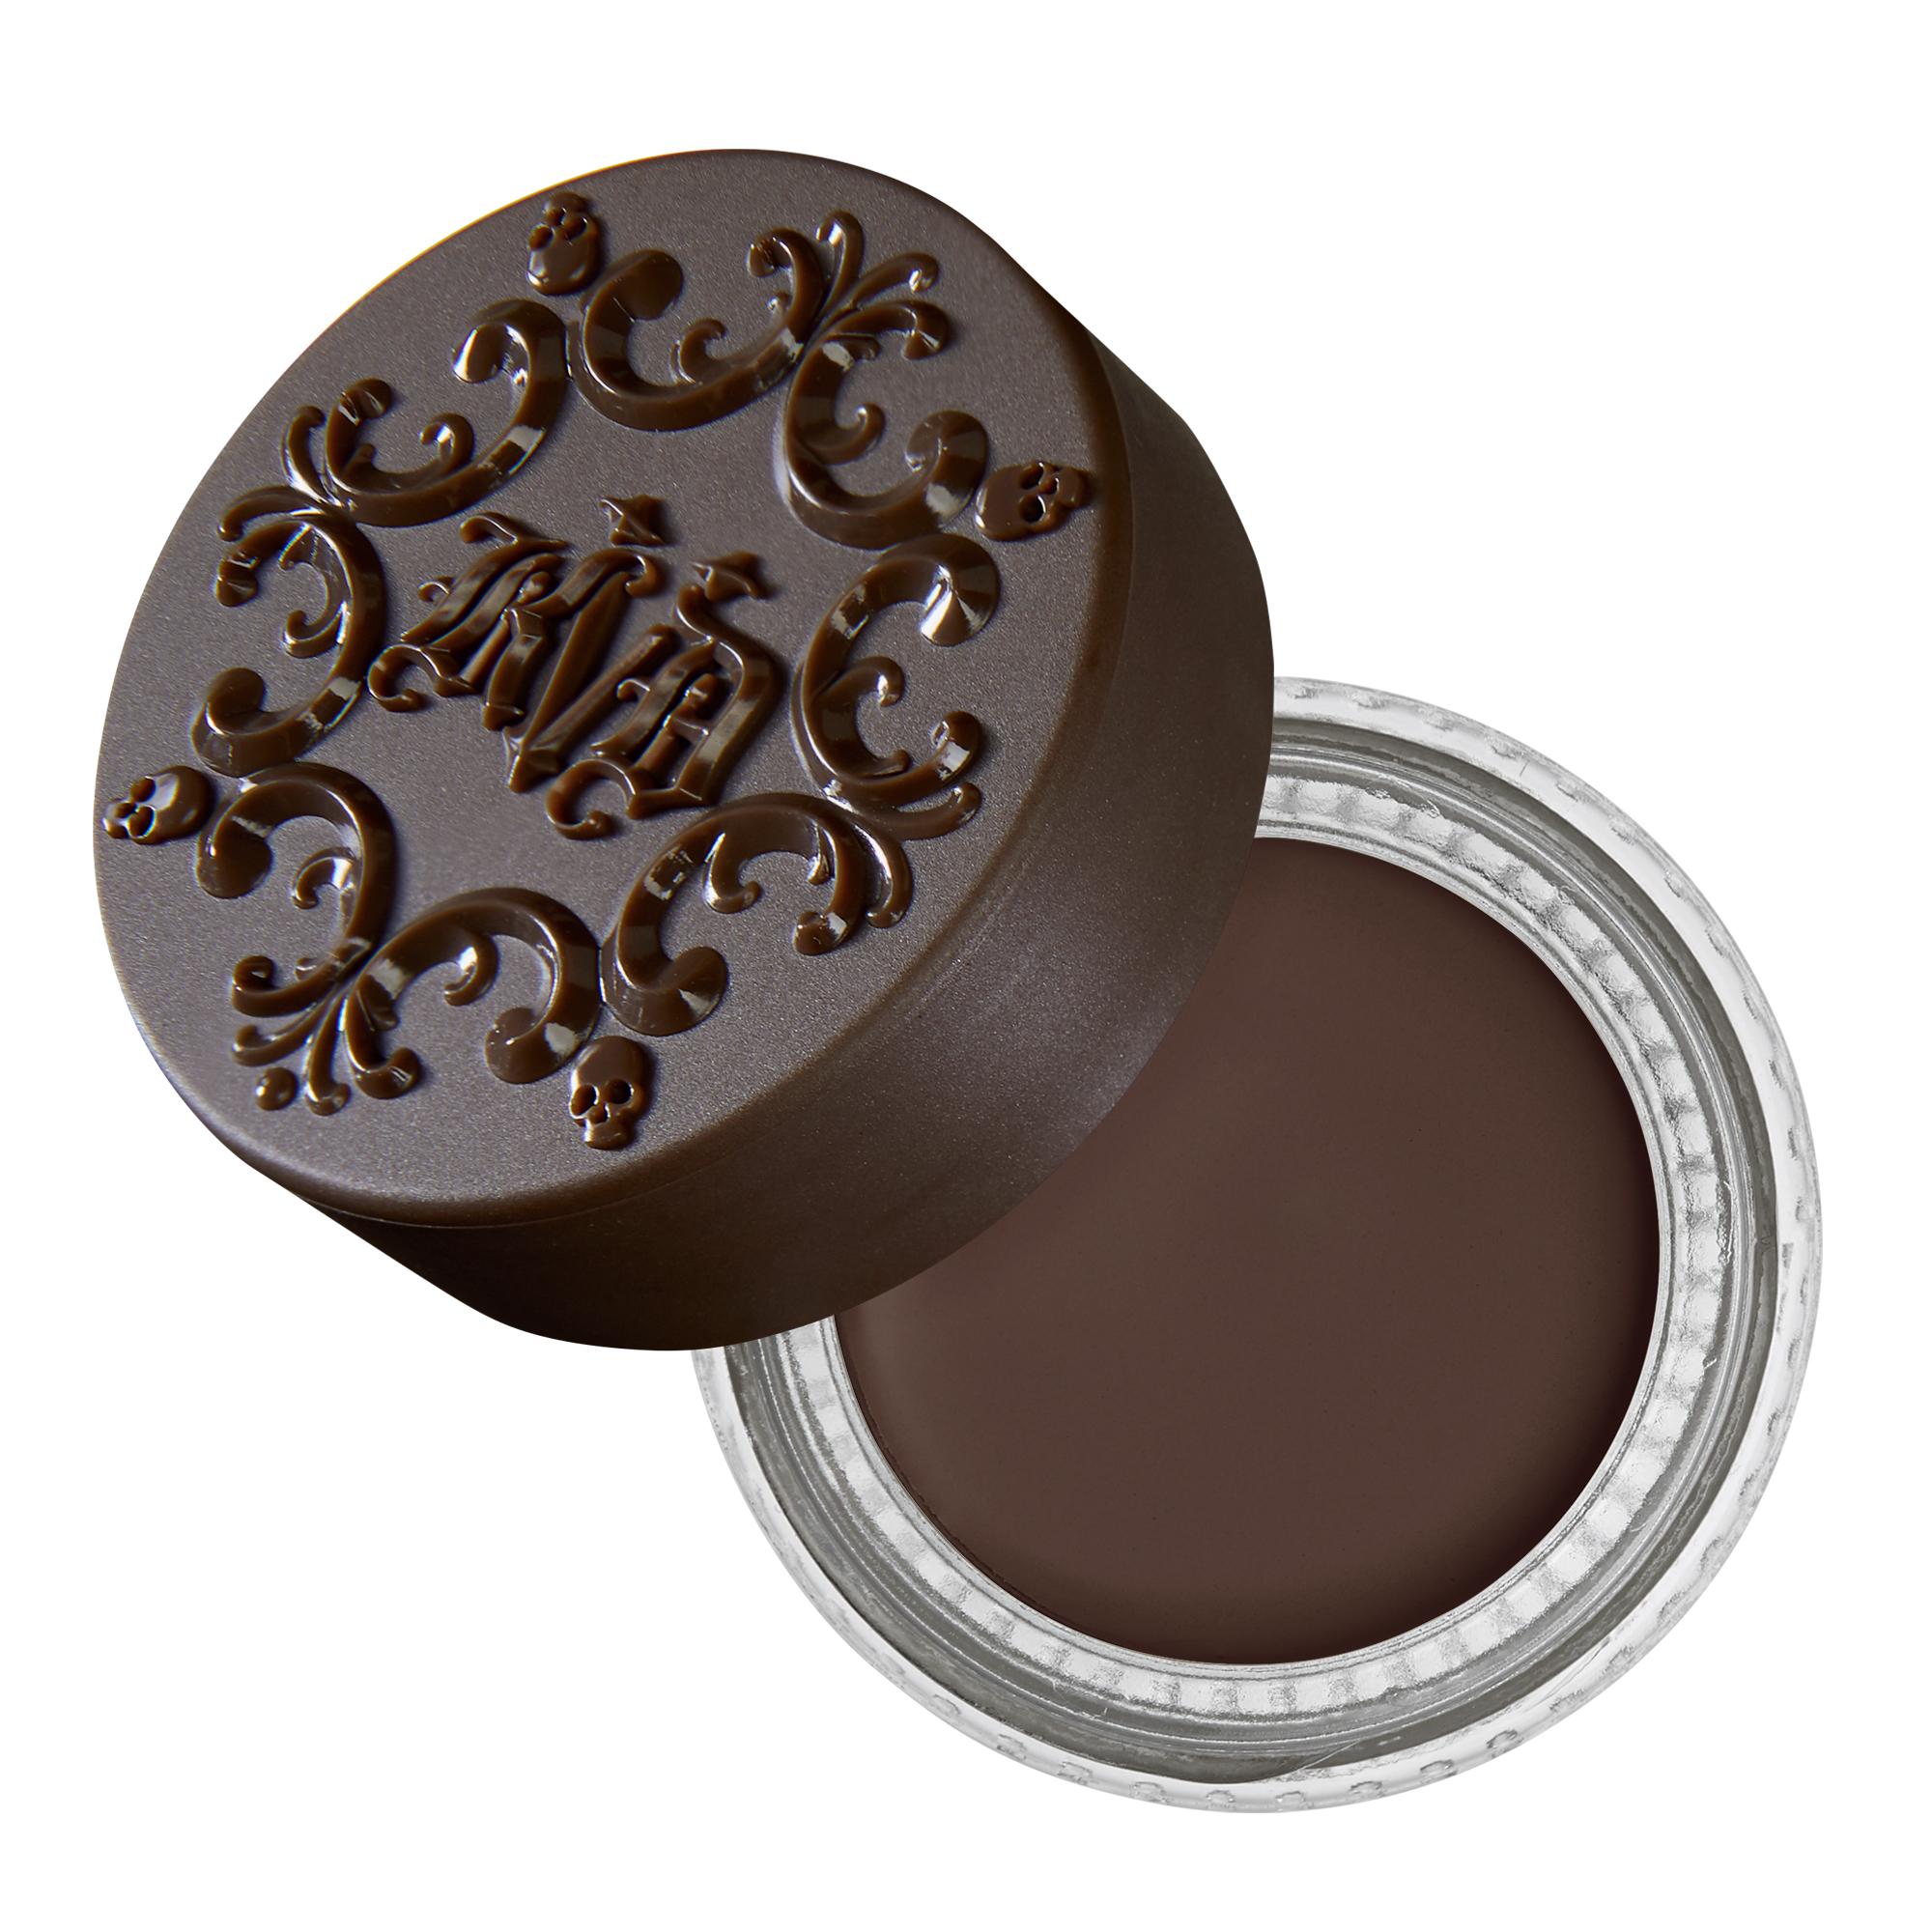 KVD Beauty Brow Creme Pot, dark brown